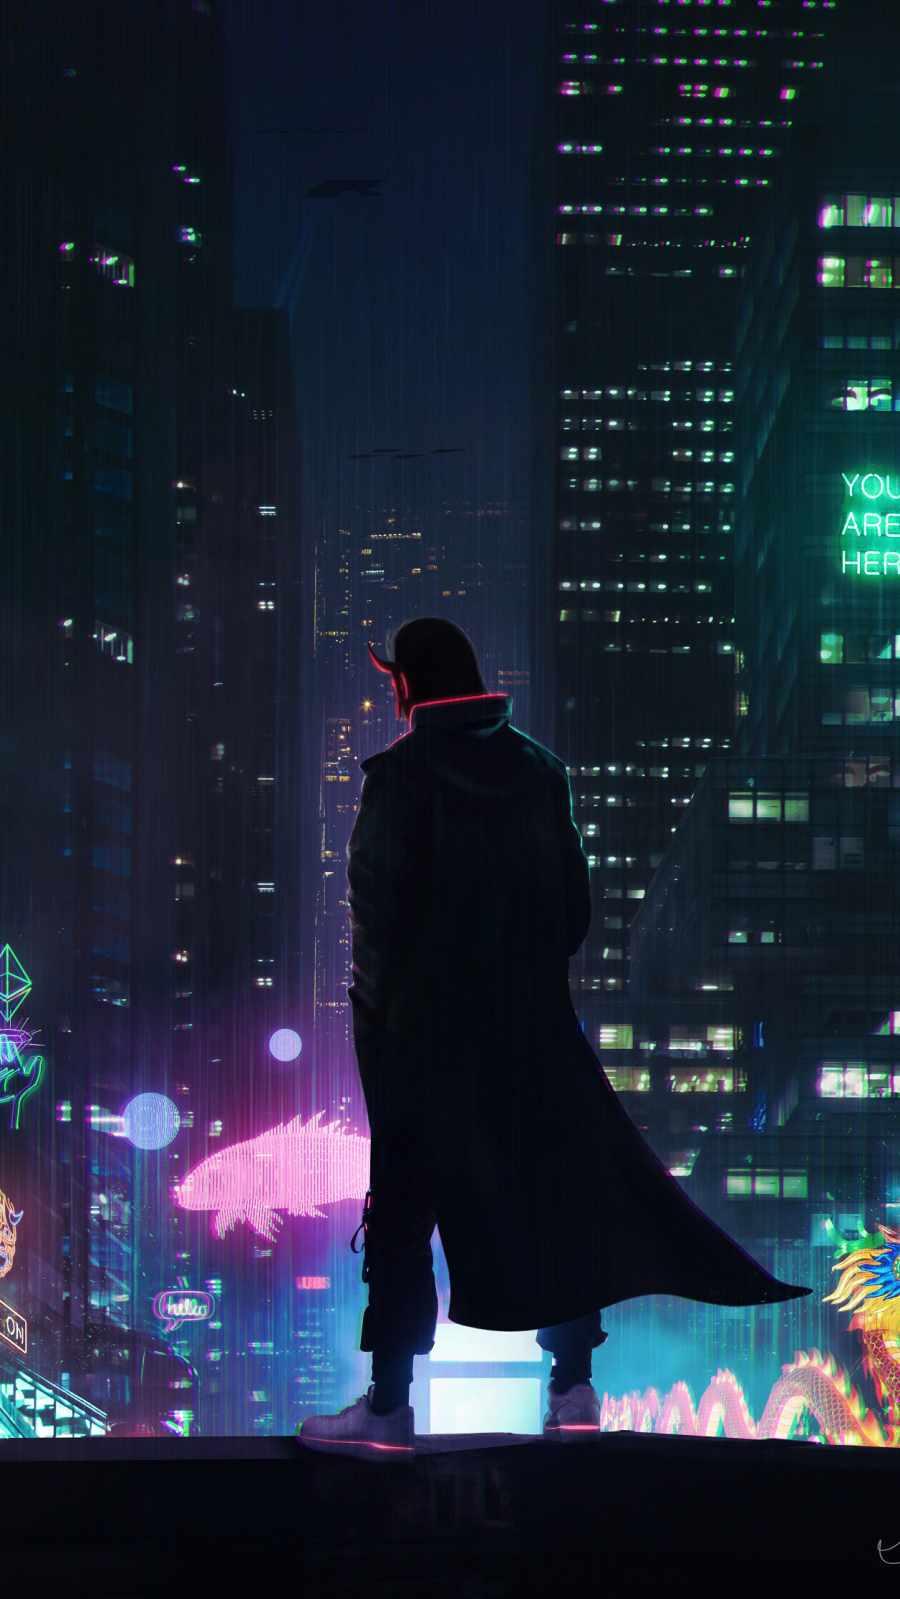 Cyber city devil